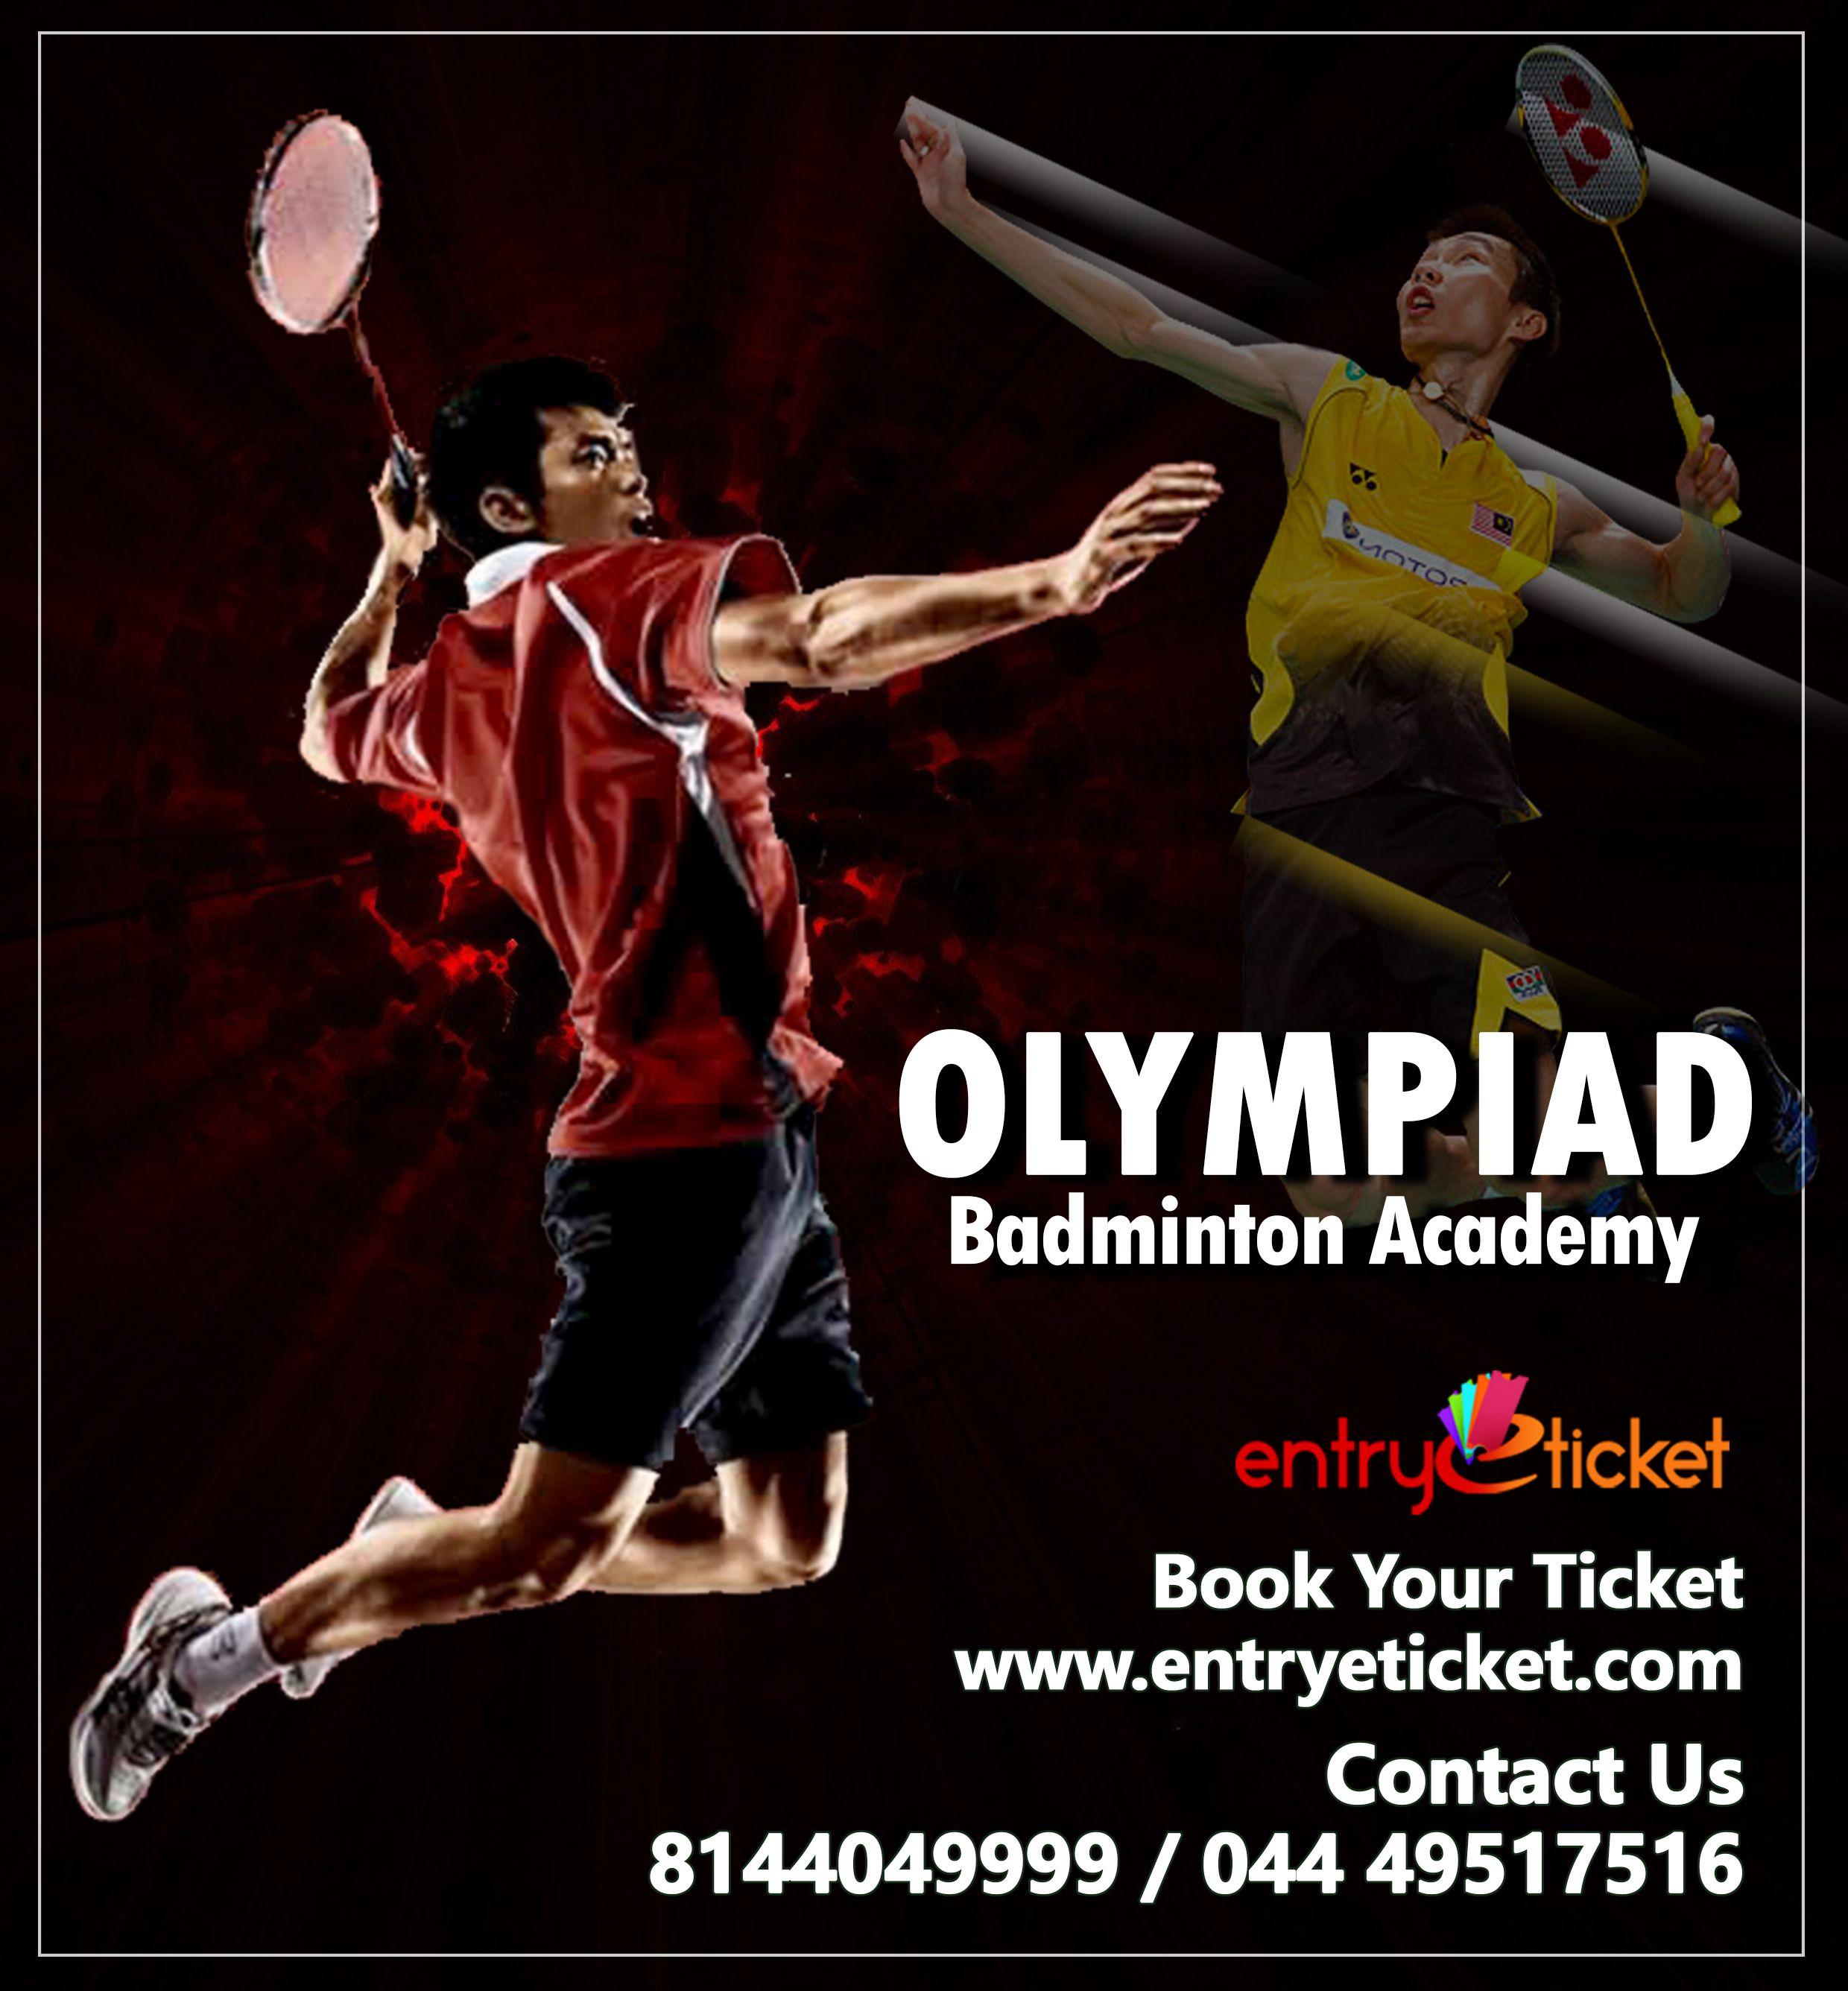 Badminton Coaching Conditioning Training Badminton Academy